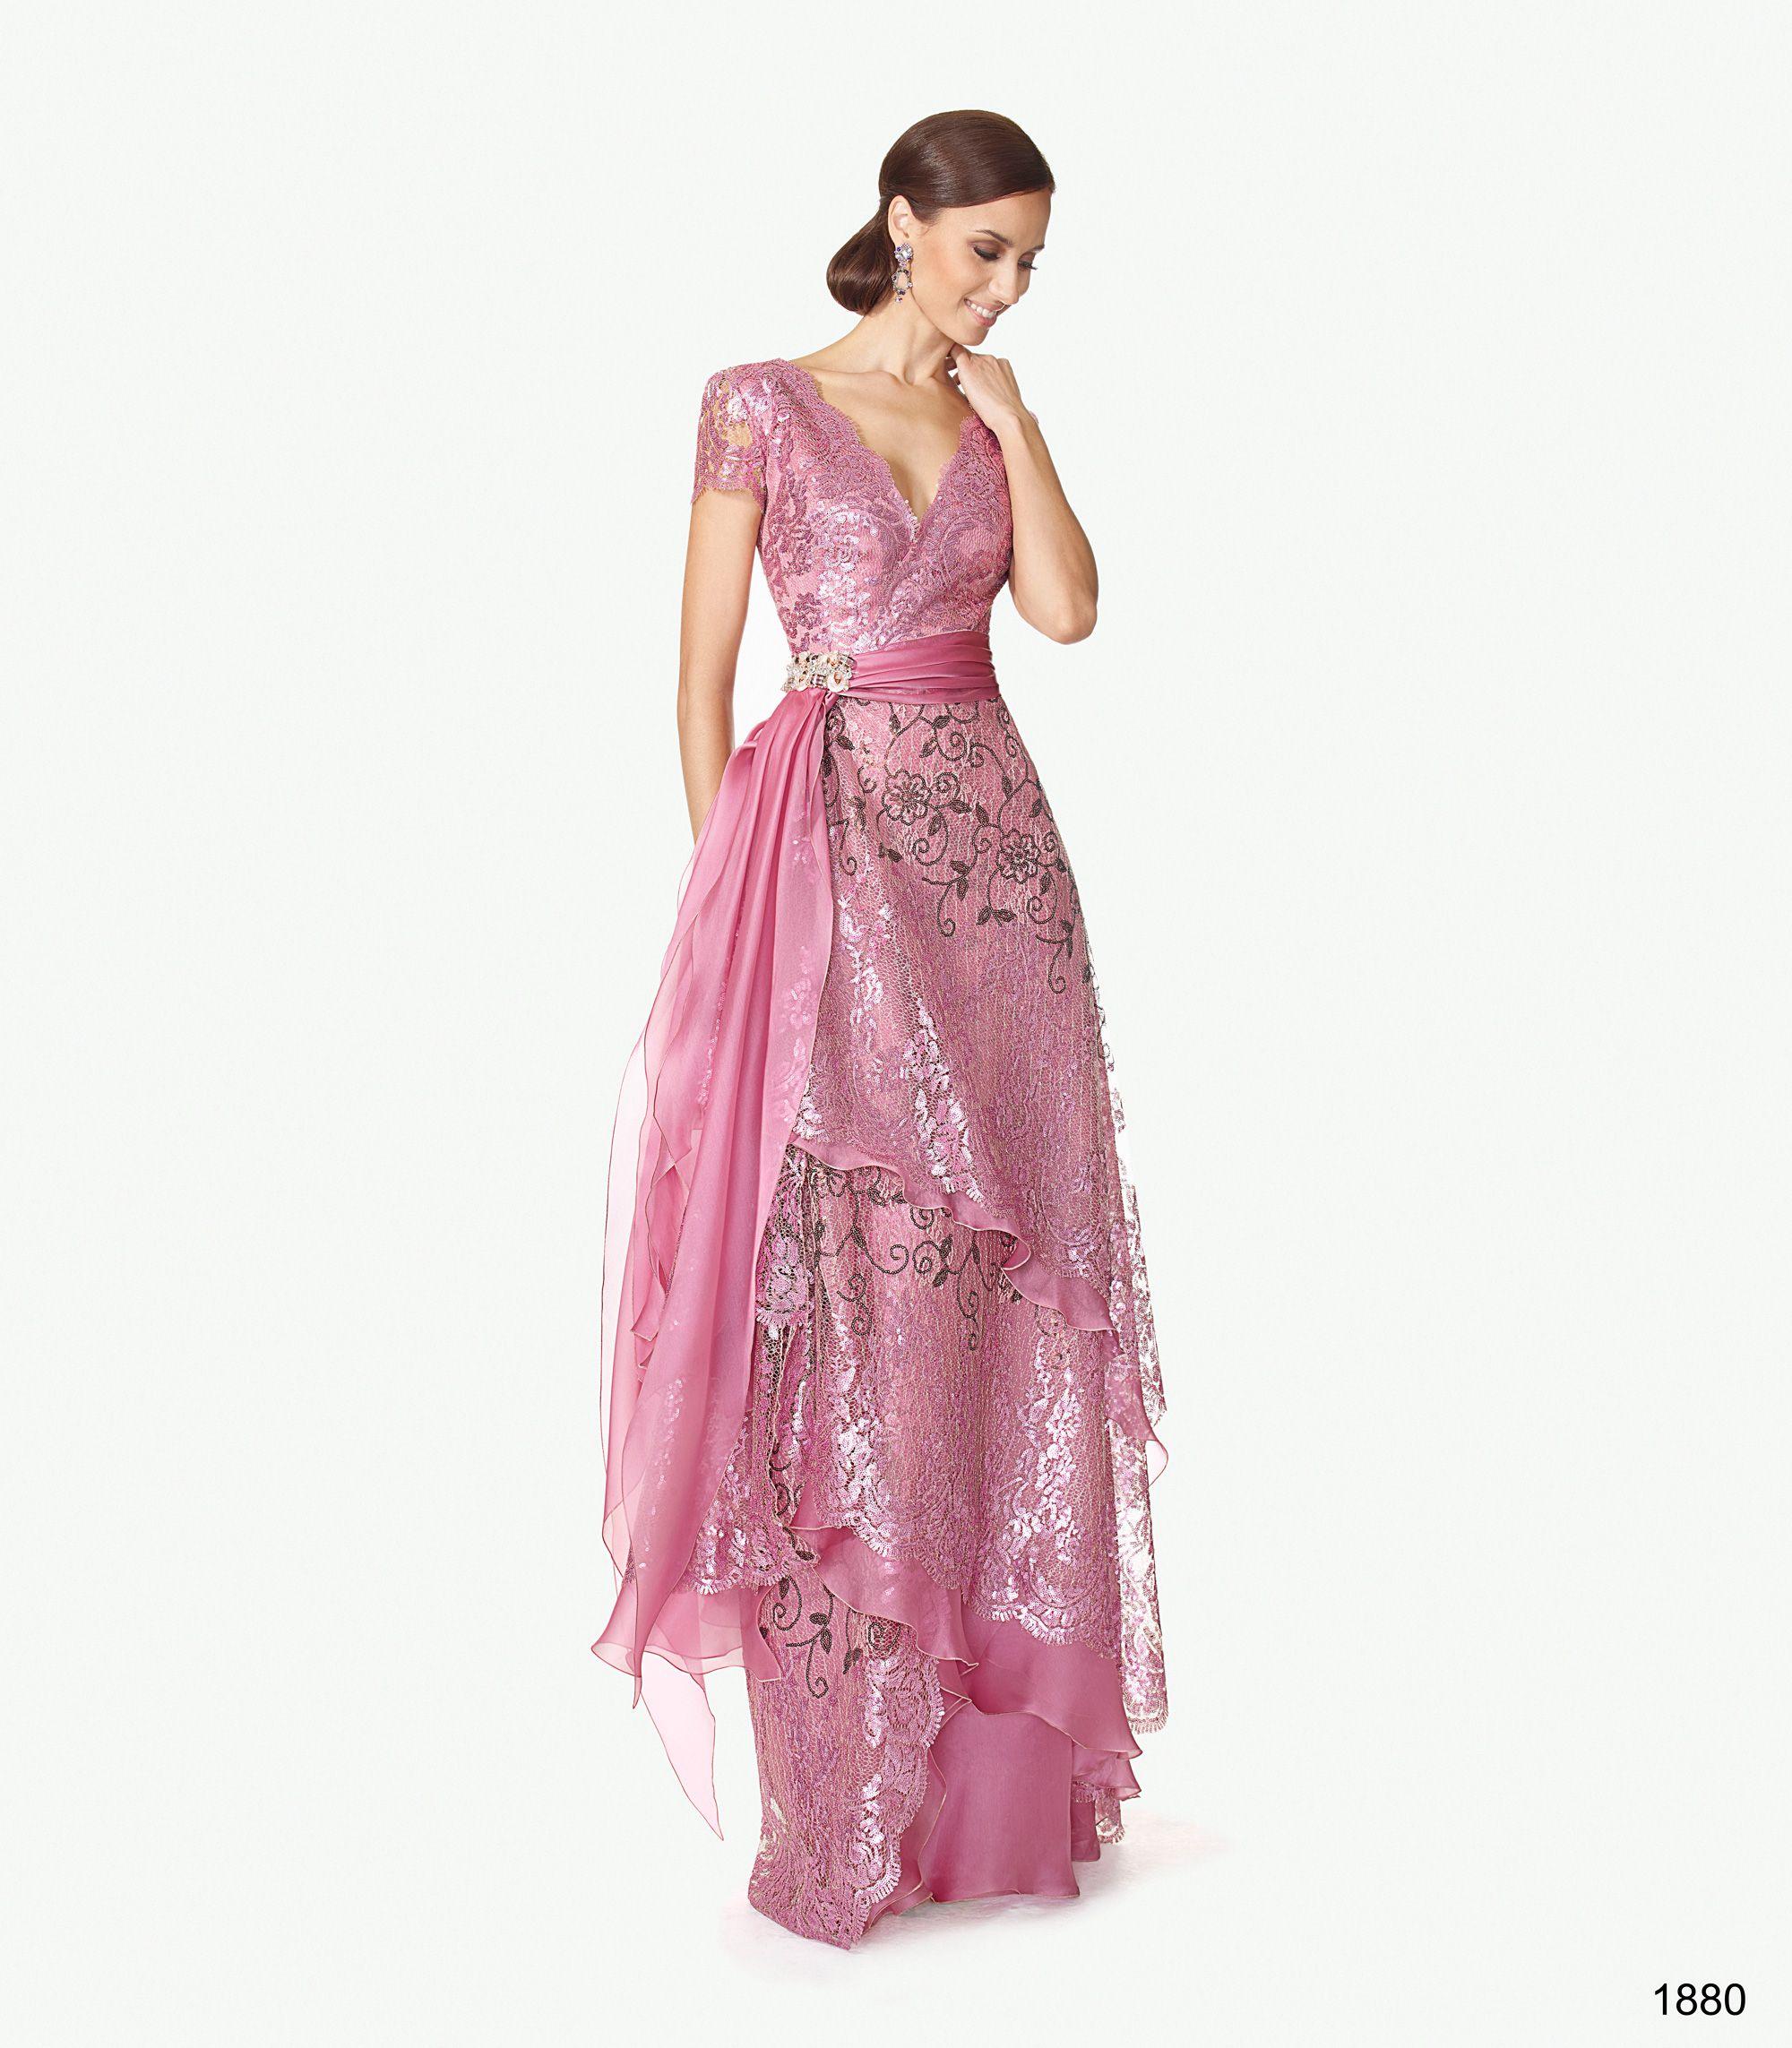 1880_1254-1 | Patricia Avendaño | Fiestas | Pinterest | Moda mujer ...